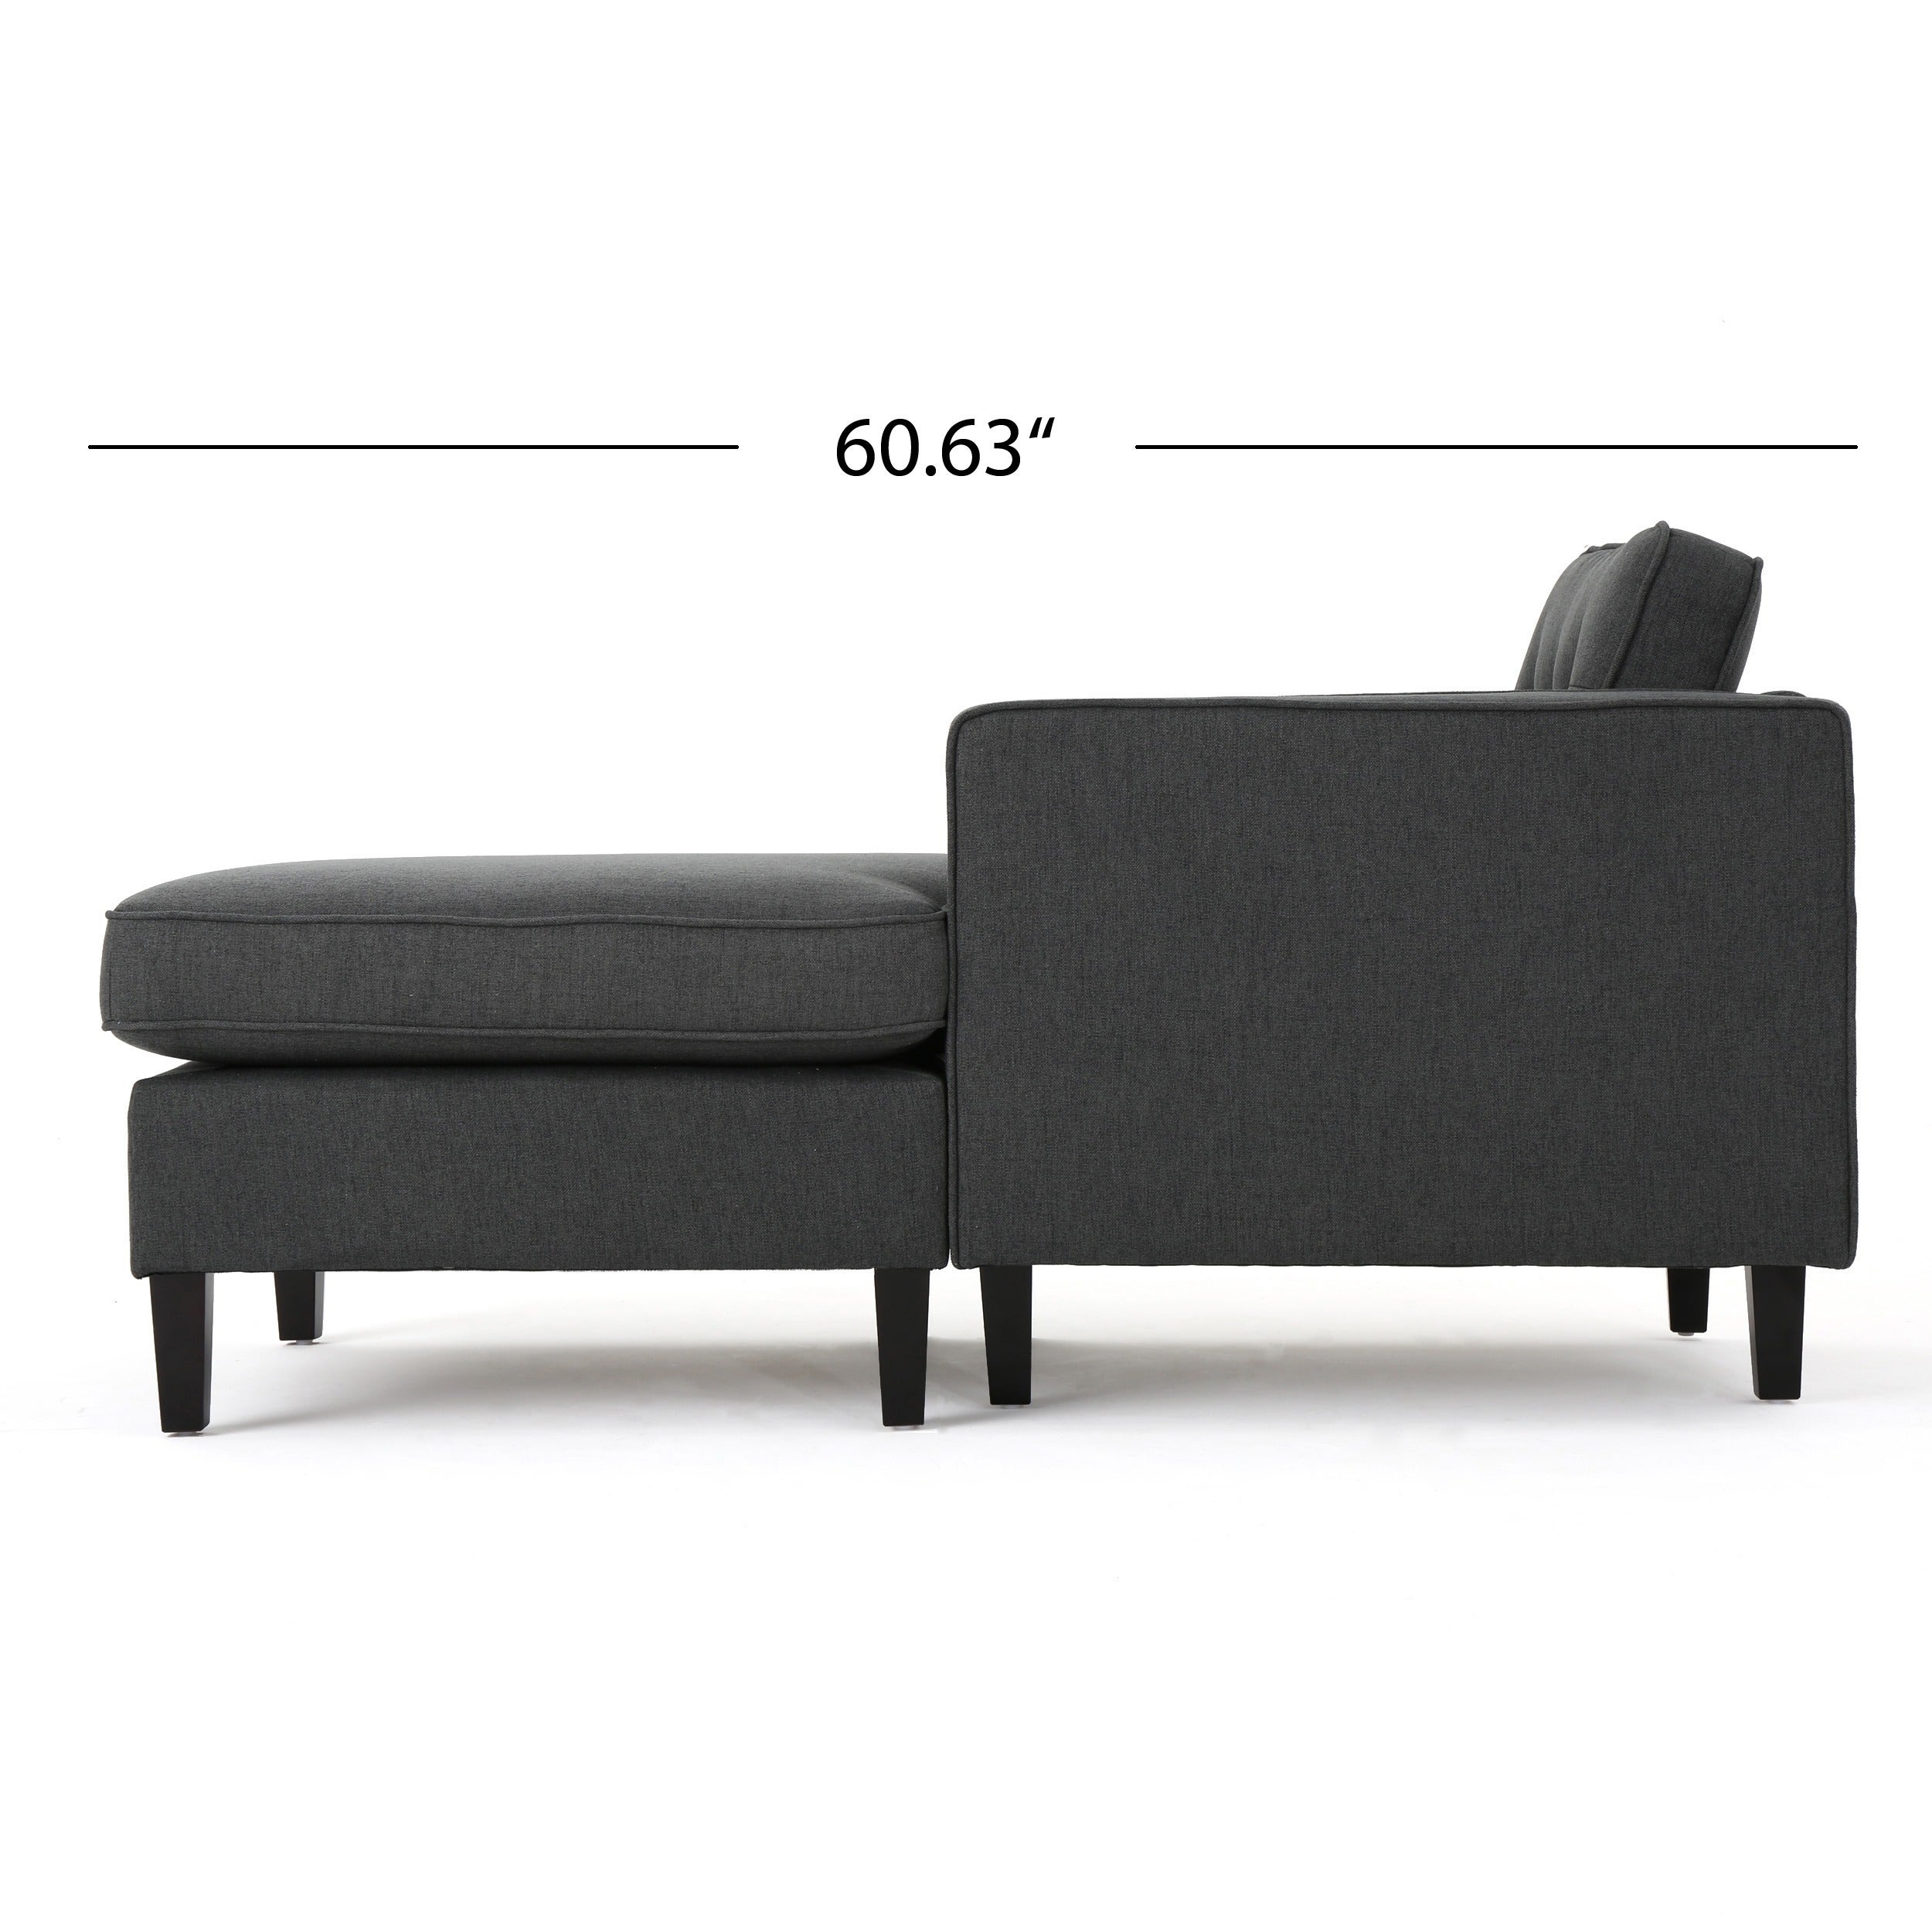 Shop Wilder Mid-century Modern 2-piece Fabric Chaise Sectional Sofa ...